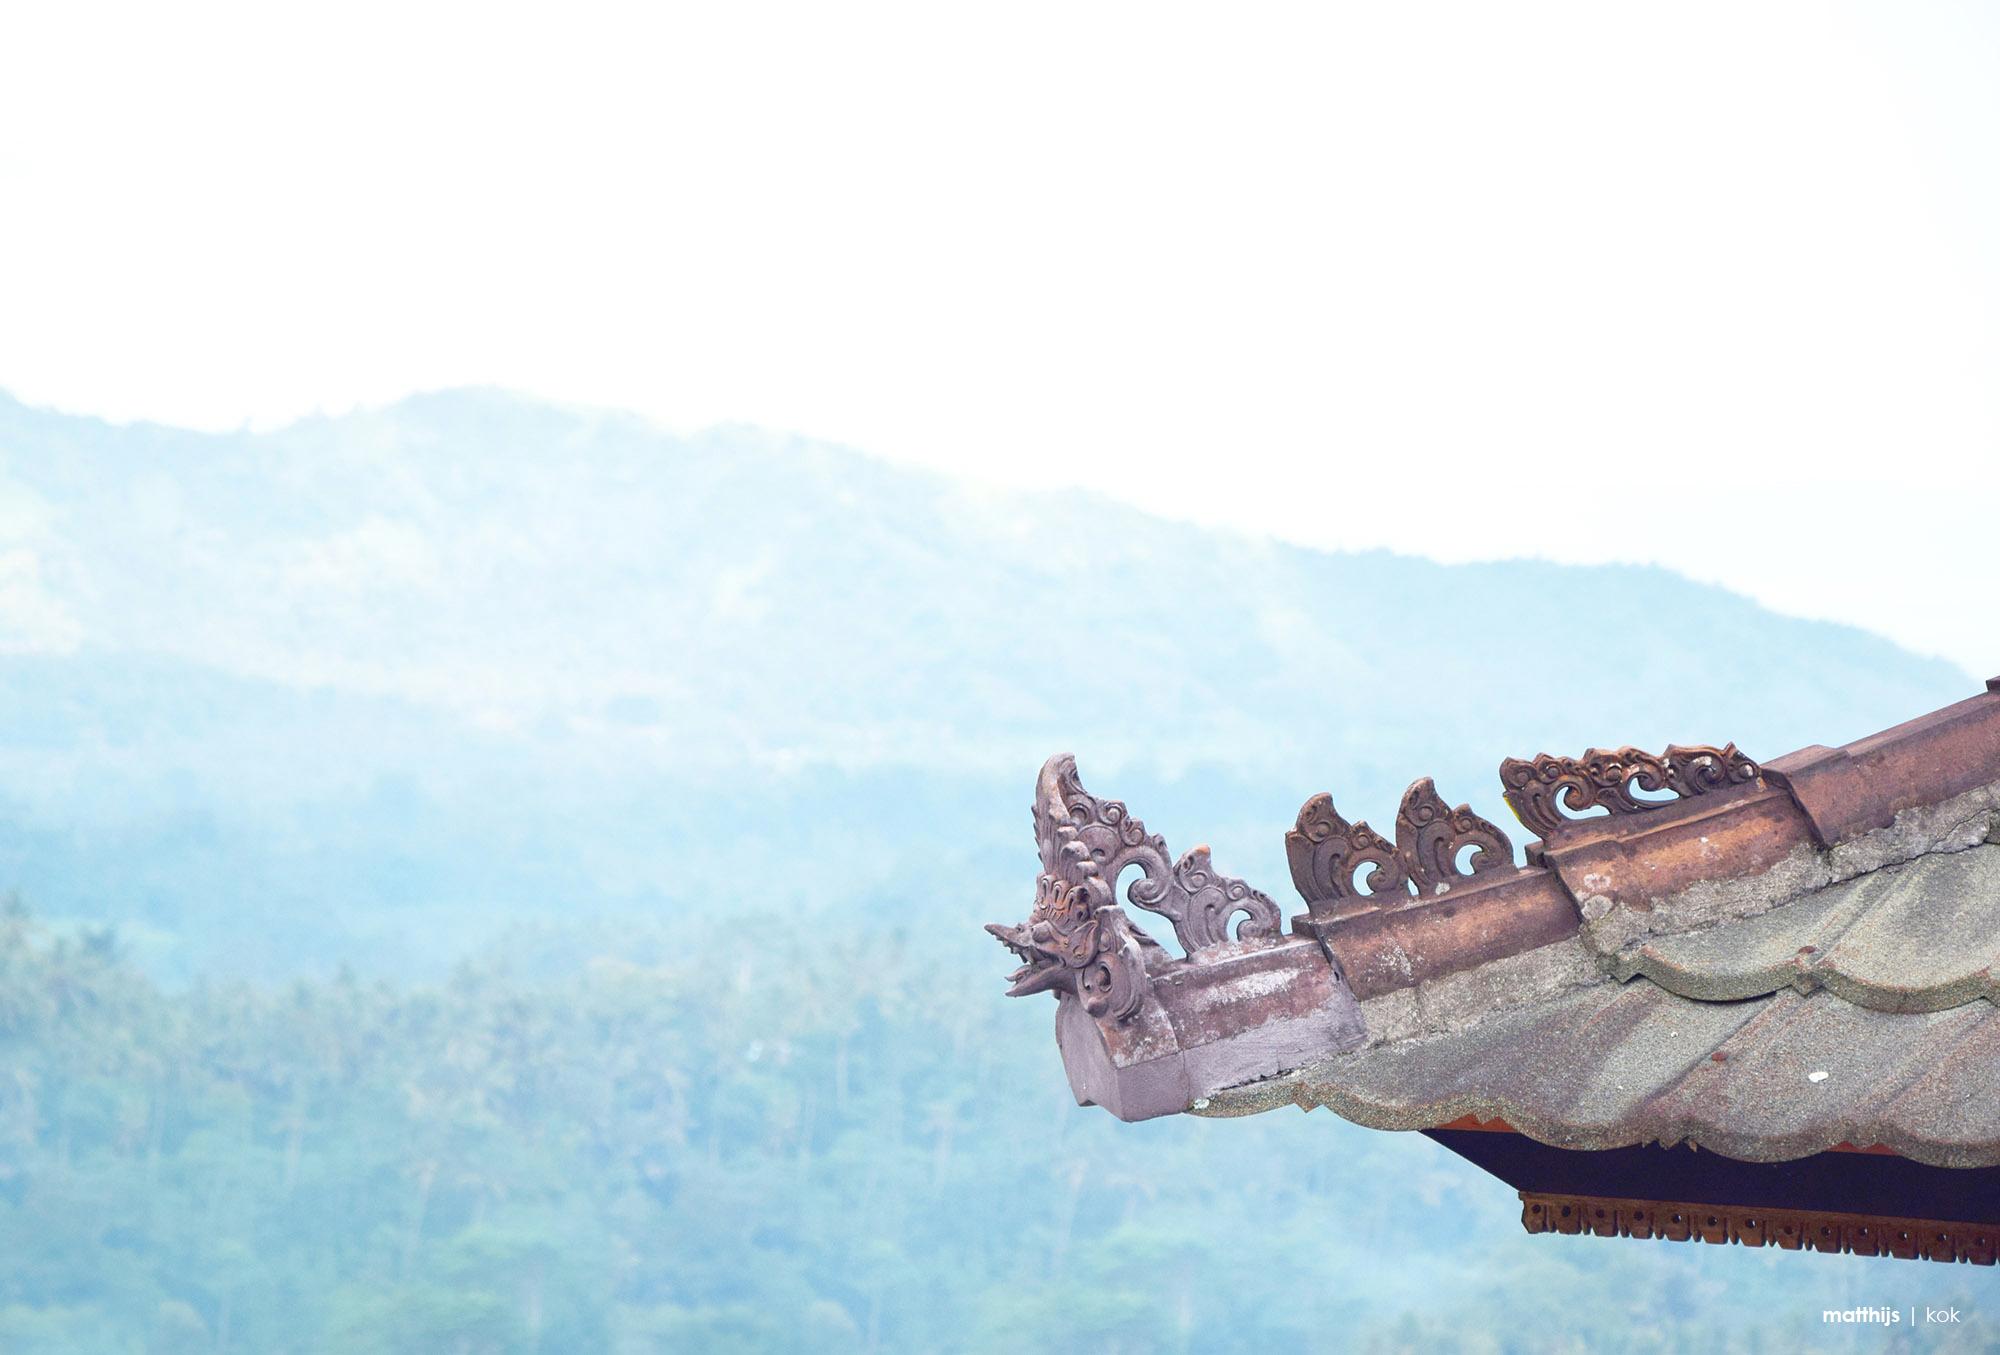 Rooftiles, Bali | Photo by Matthijs Kok